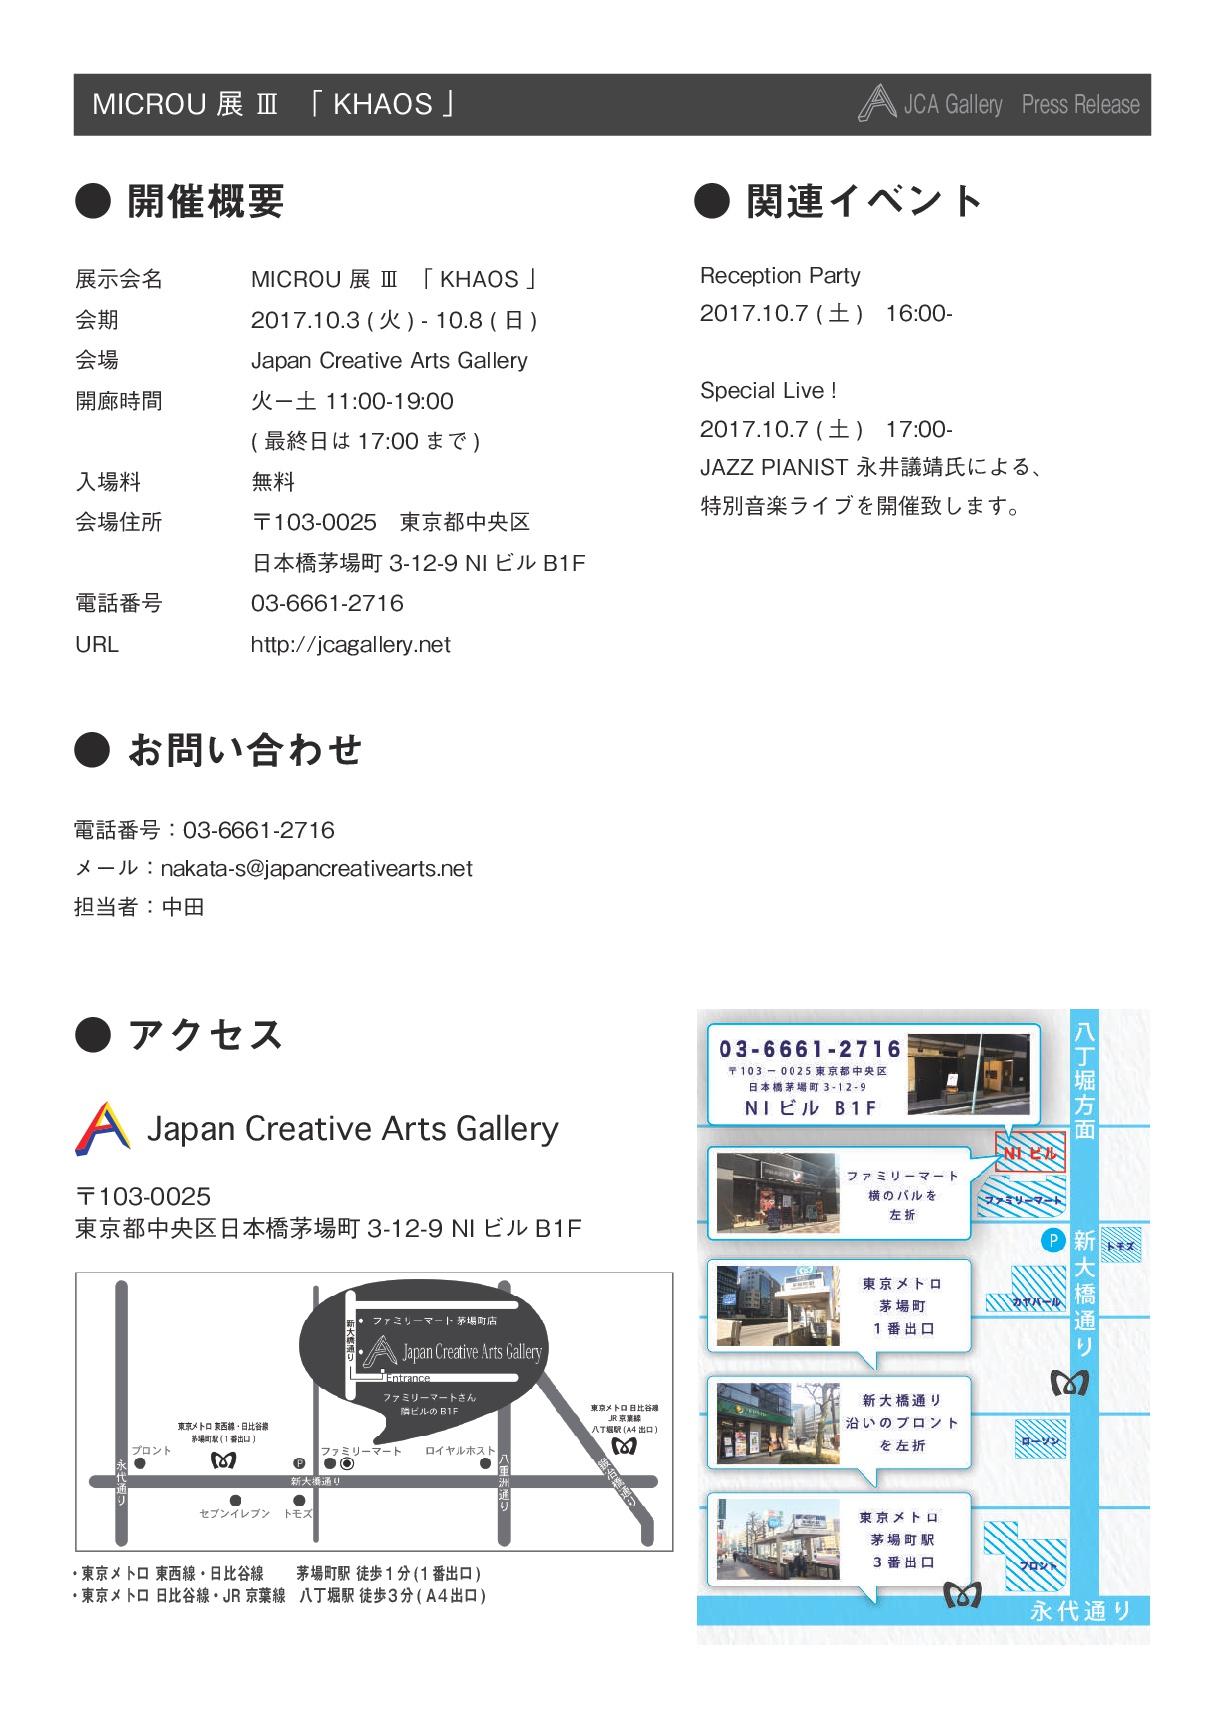 Japan Creative Arts Gallery